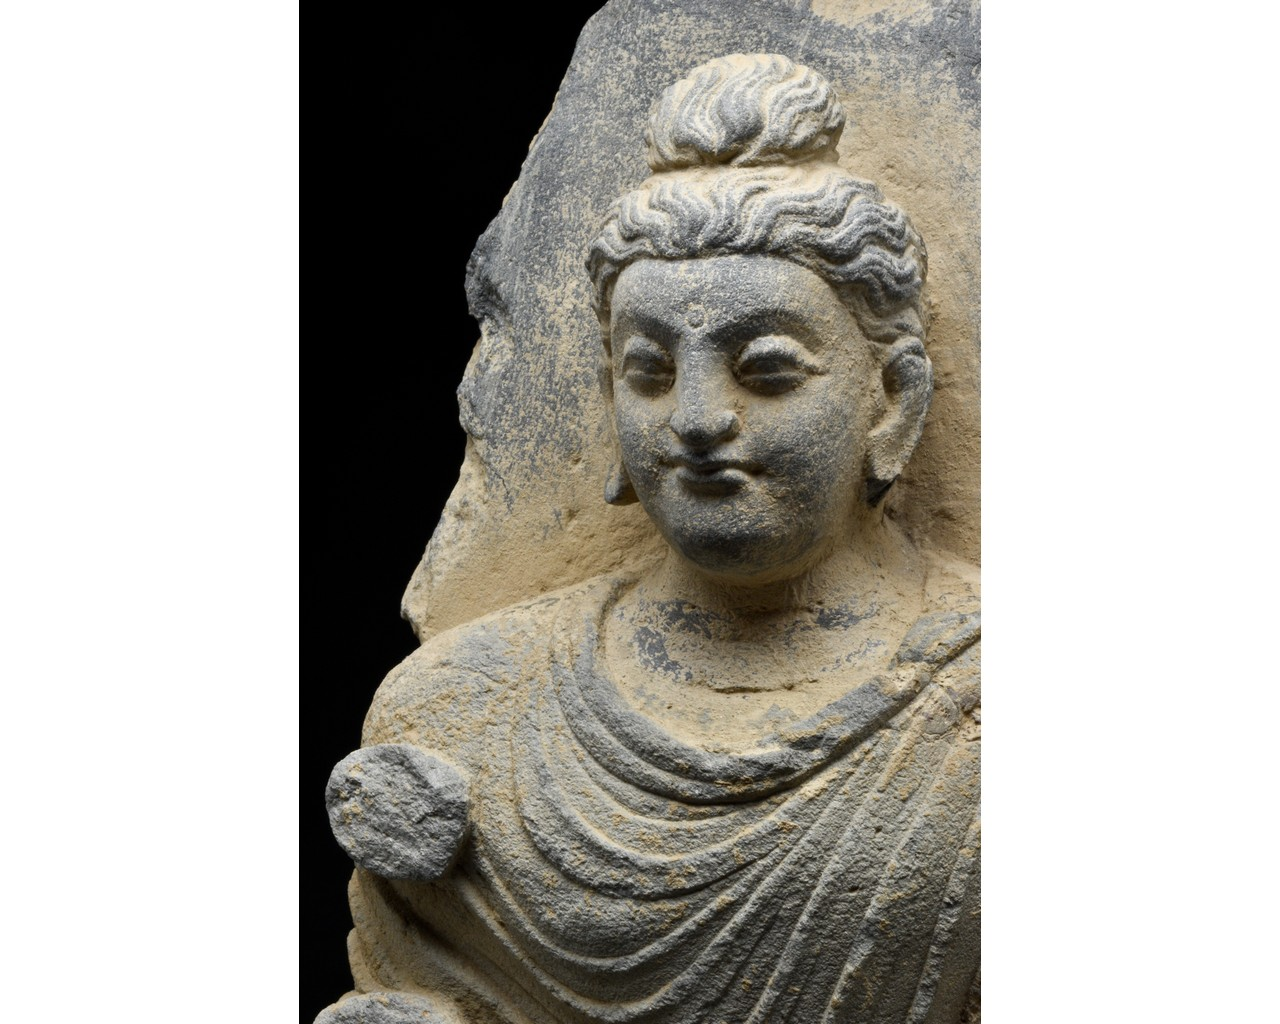 GANDHARA SCHIST TORSO OF BUDDHA - Image 5 of 5